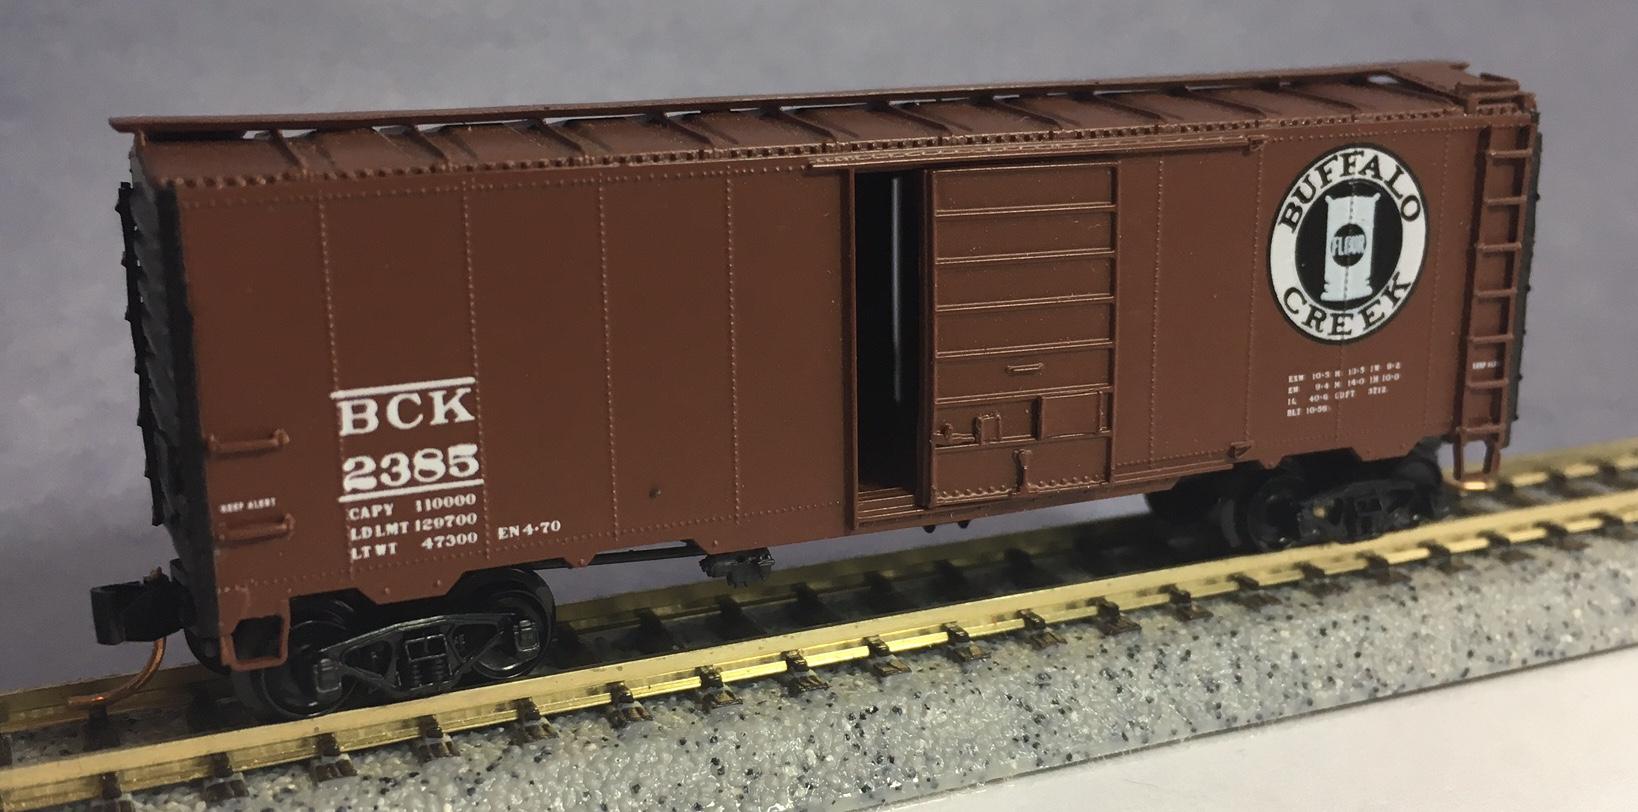 N Scale - InterMountain - 2385 - Boxcar, 40 Foot, AAR 1937 - Buffalo Creek - 2385